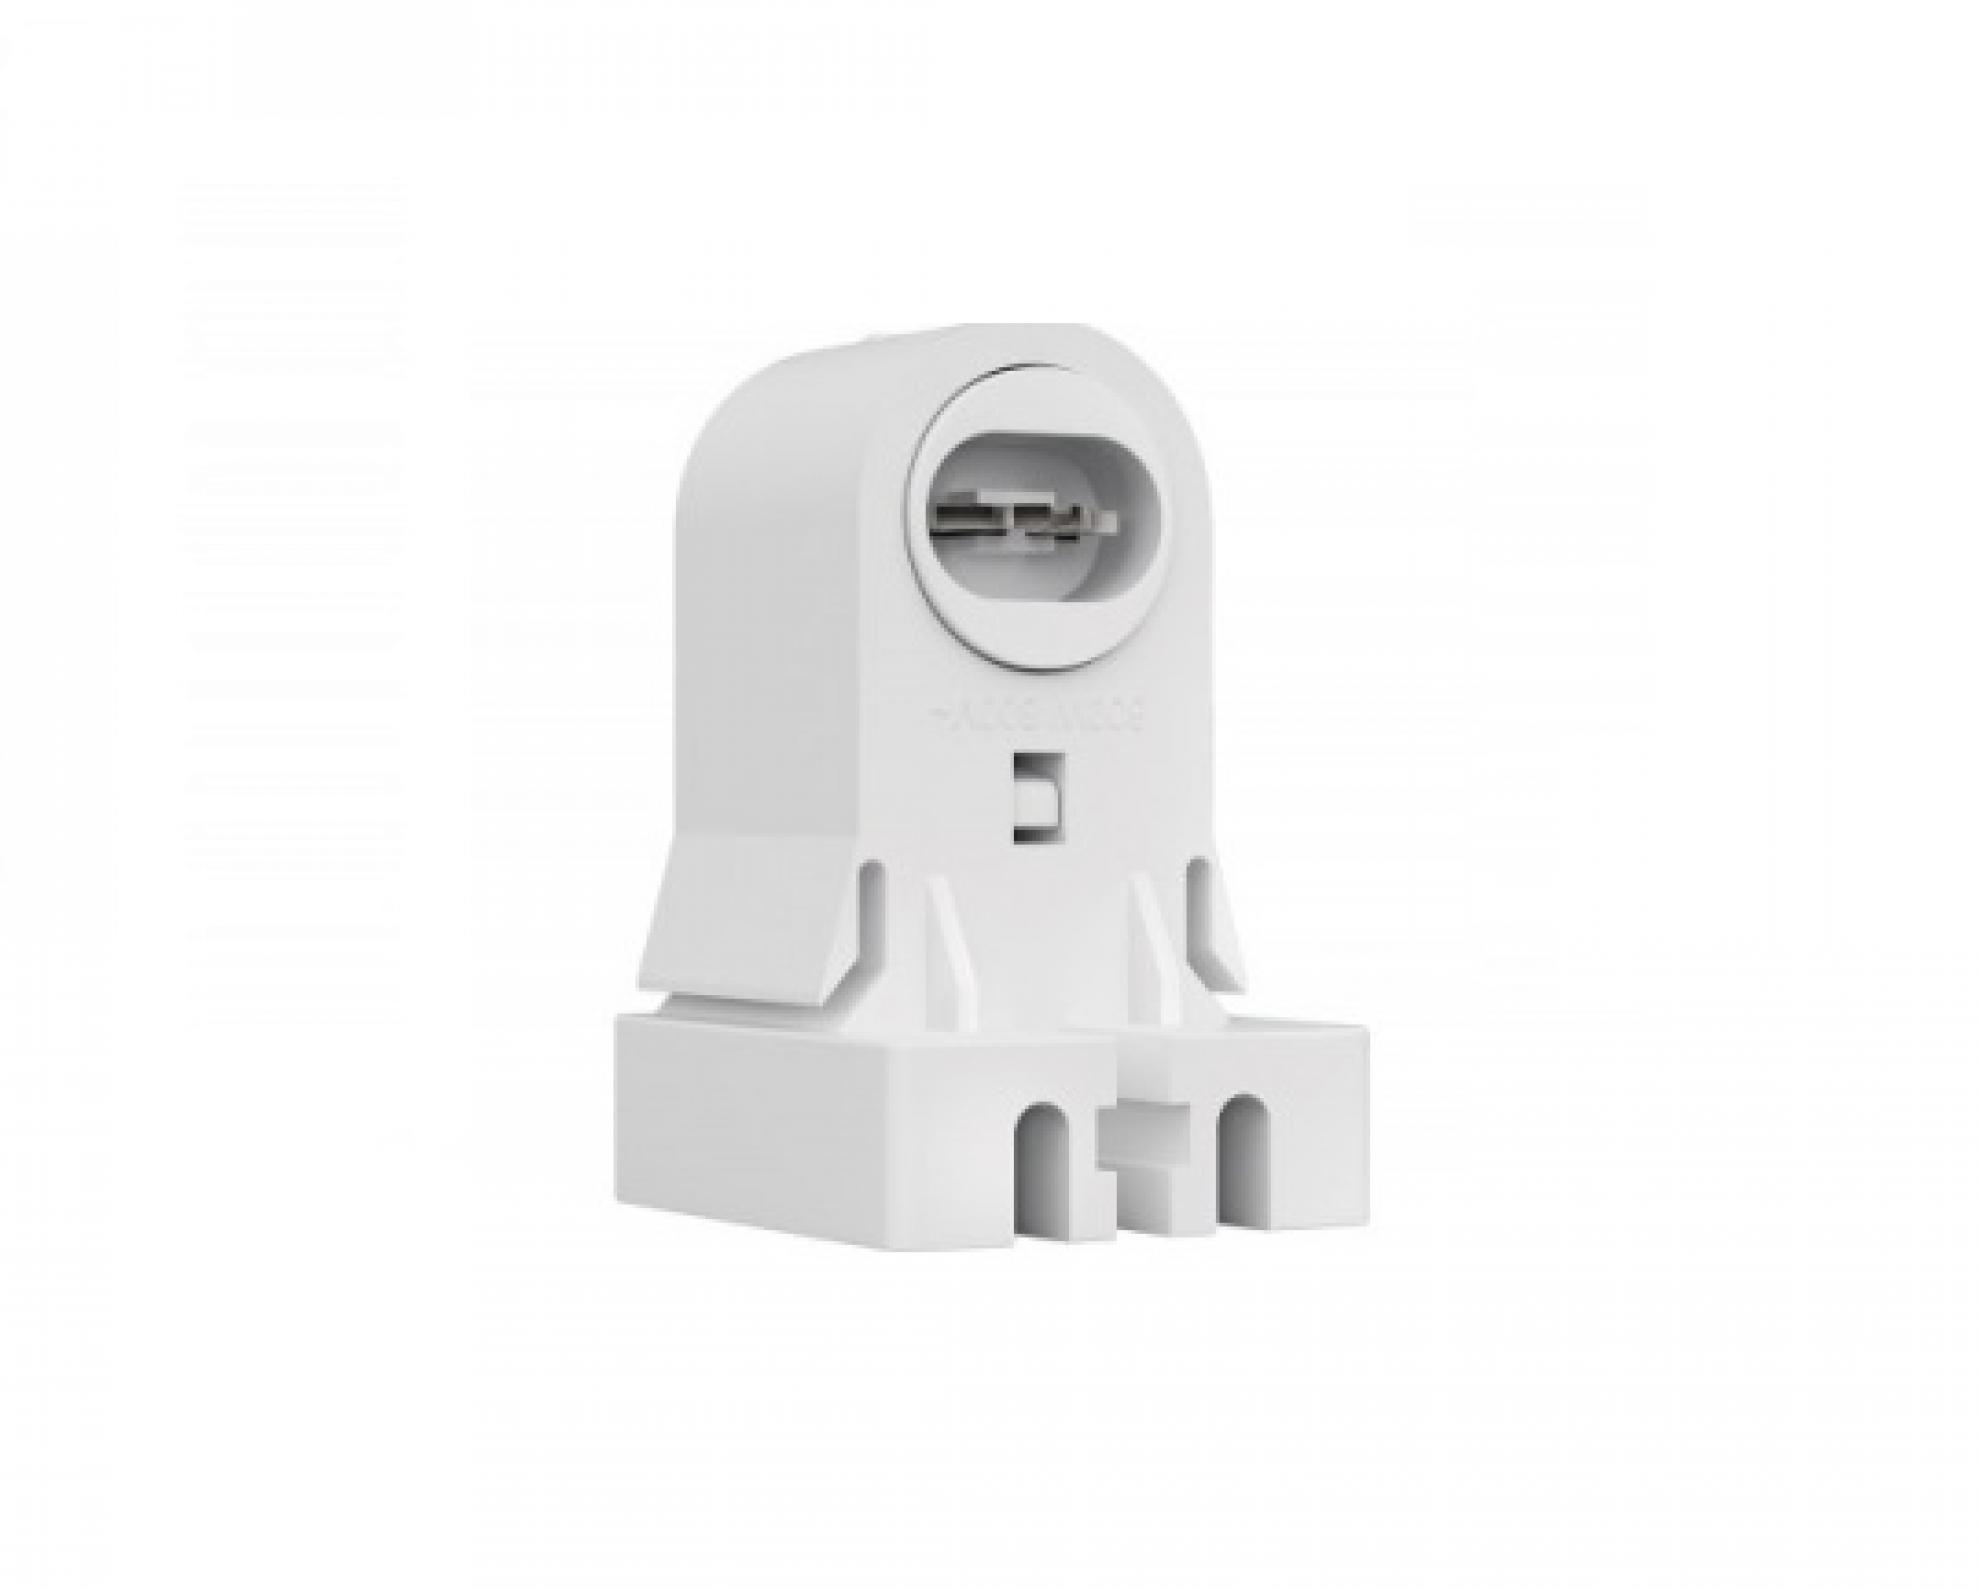 Soquete nylon para lampada HO 600V-660W - Fixo